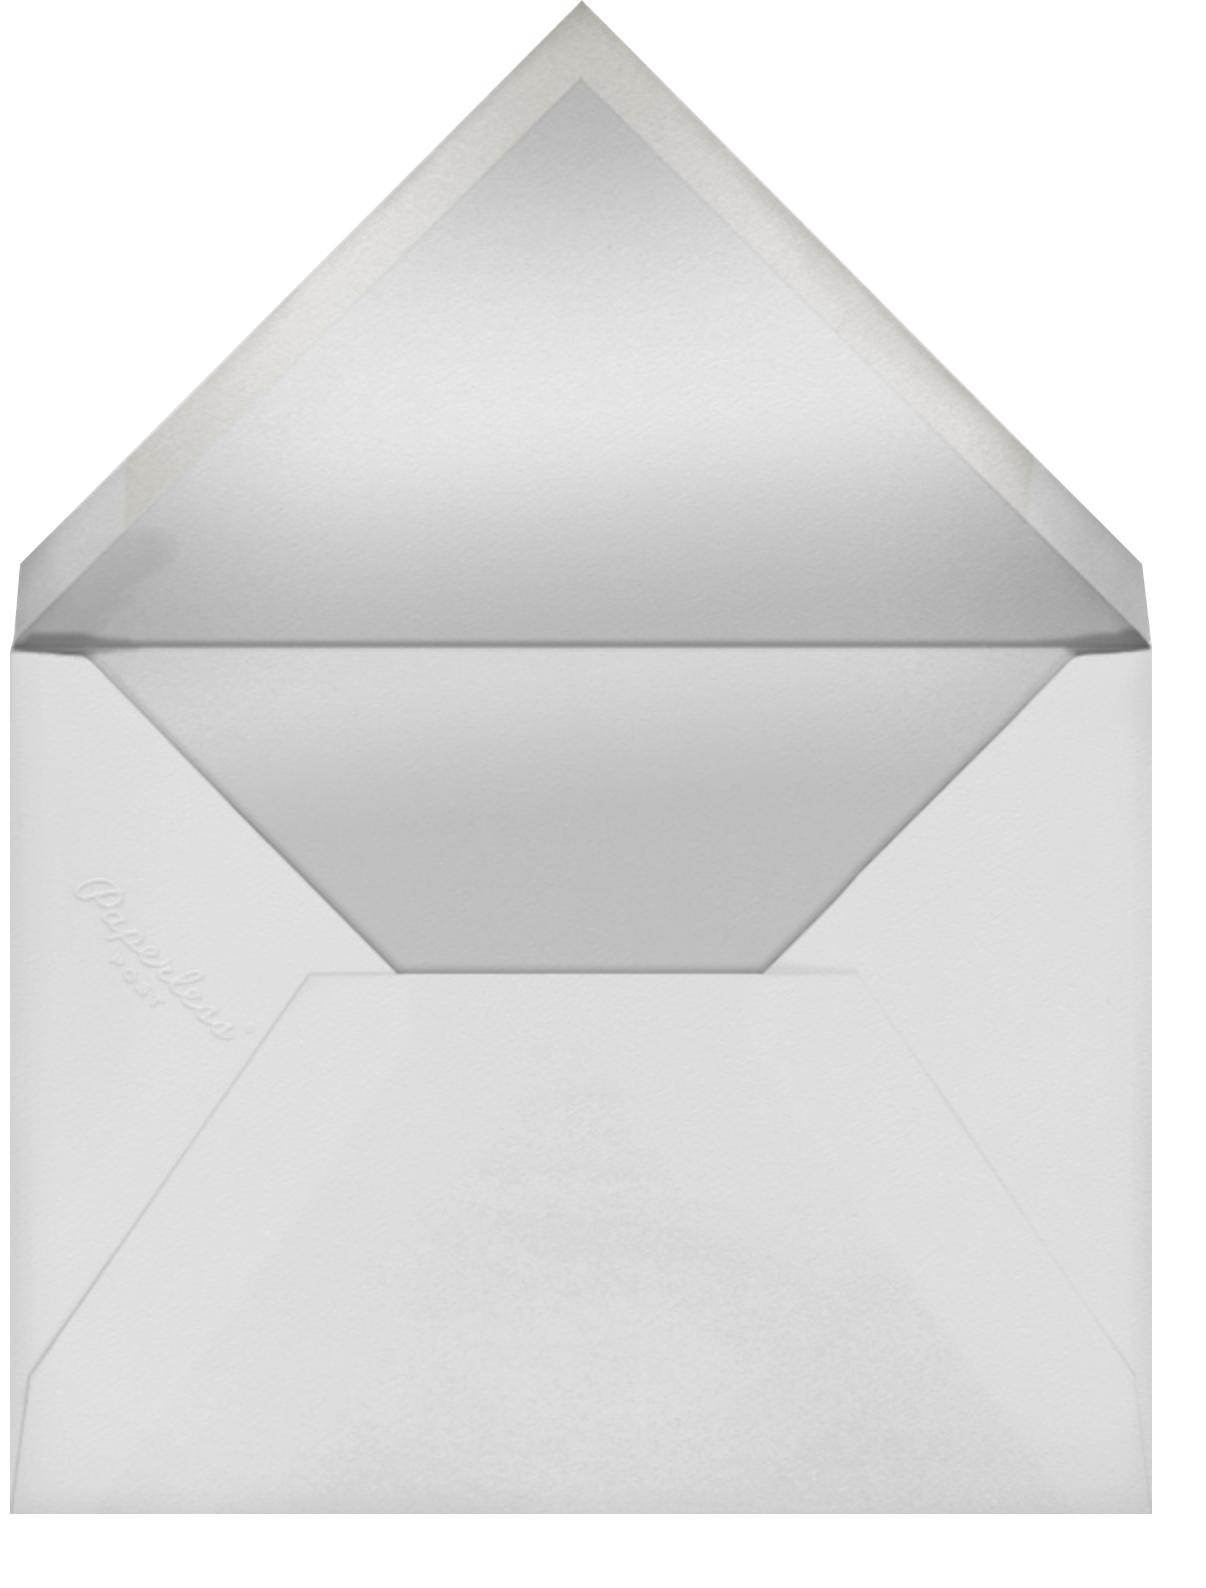 Glacier (Square) - Paperless Post - Barbecue - envelope back